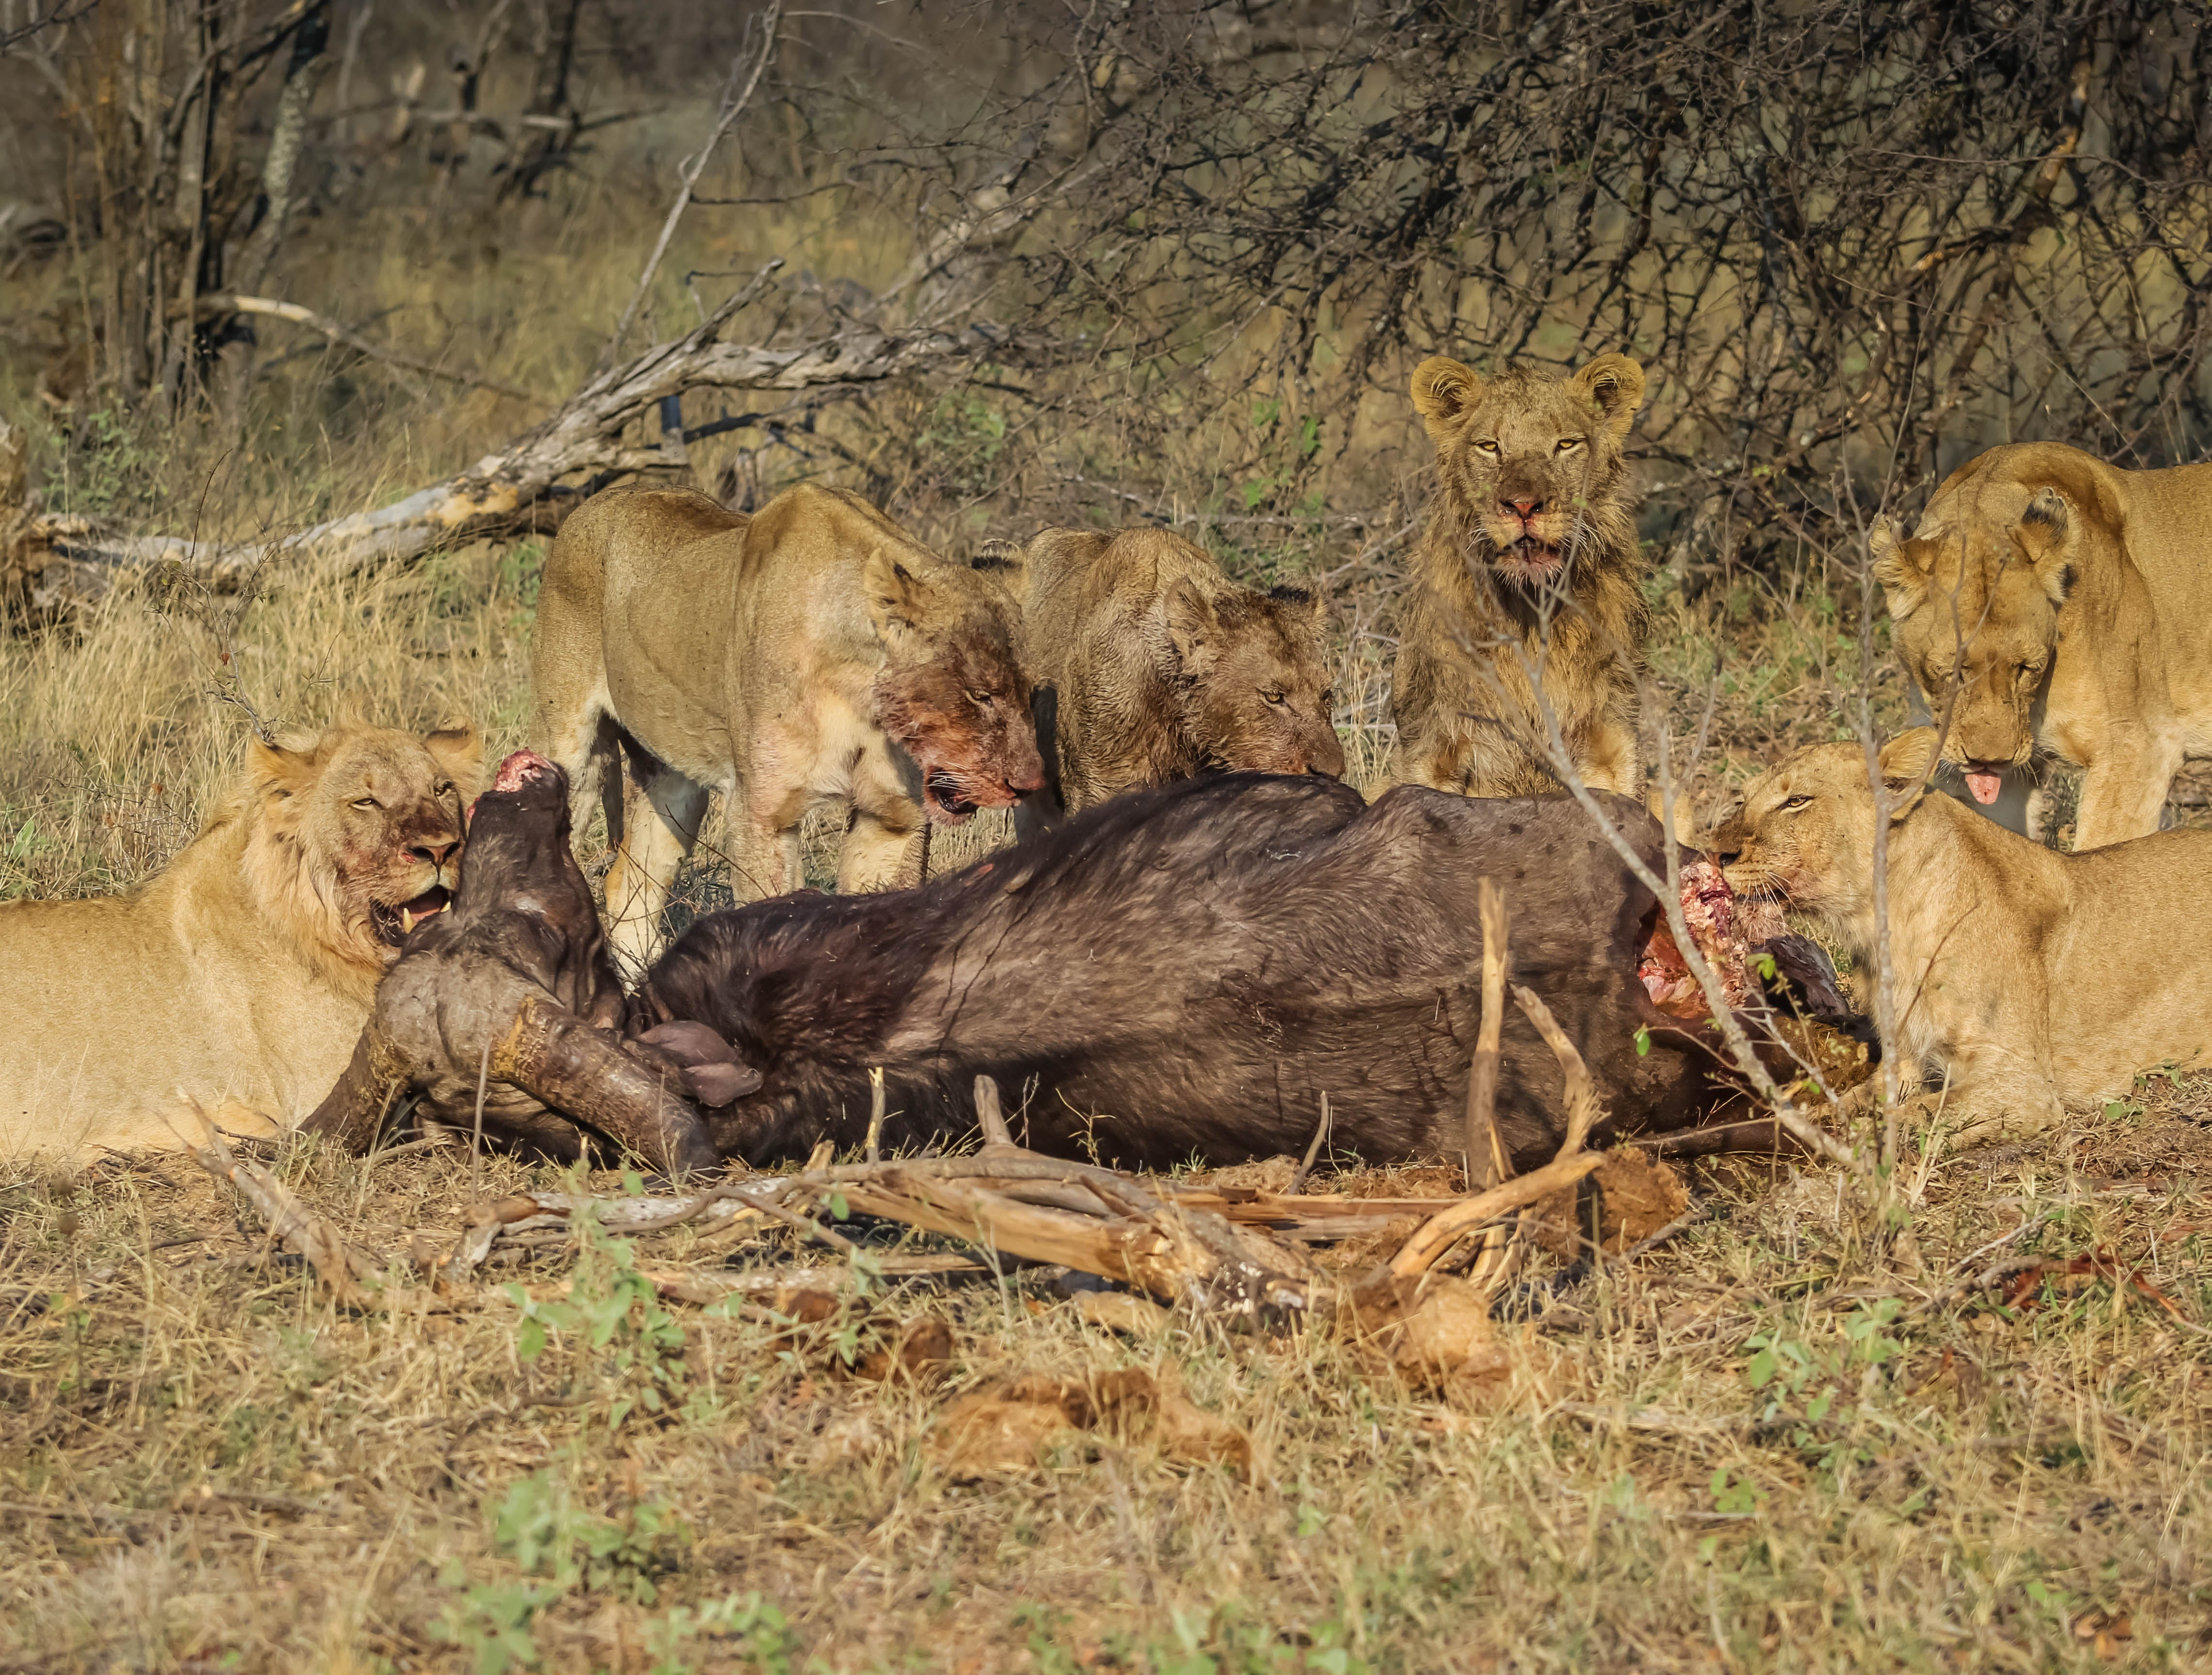 Kostenloses Stock Foto zu löwe, tierwelt, große katze, tier fotografie